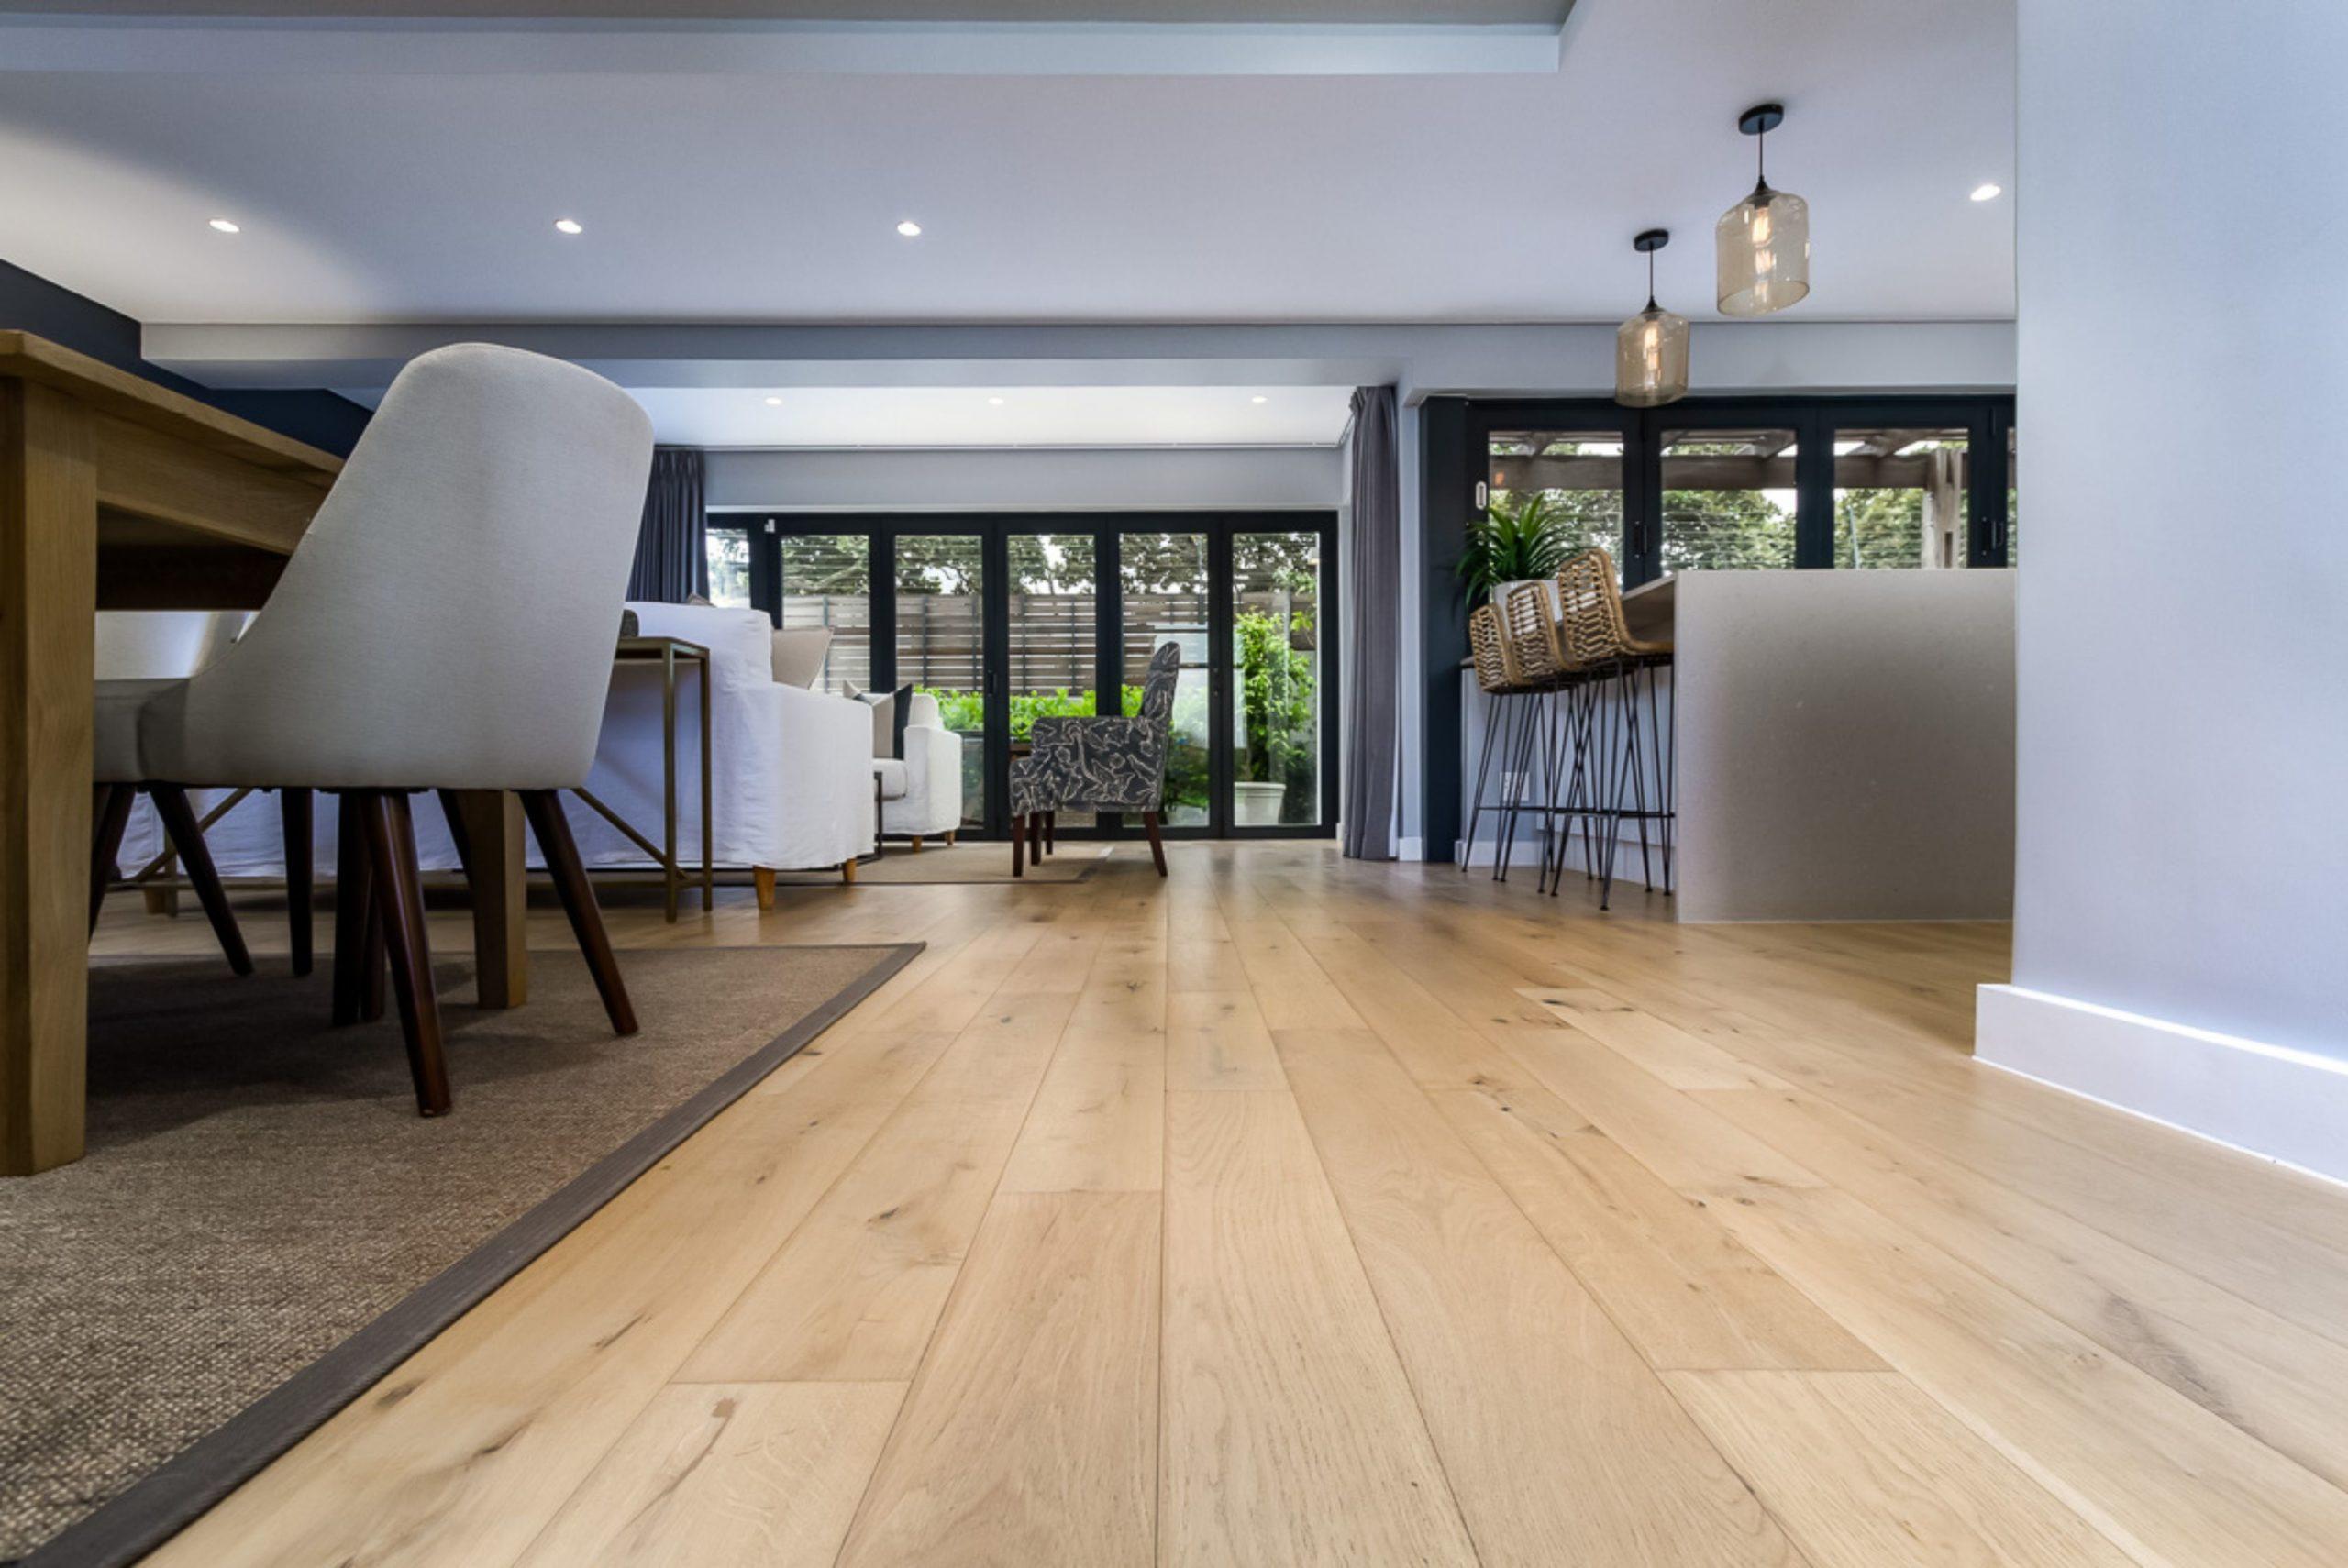 lowest cost homeadvisor installation tarkett bedroom ideas india laminate wooden price cozy wood kit reviews striking with floor prices floors advantages drawbacks flooring